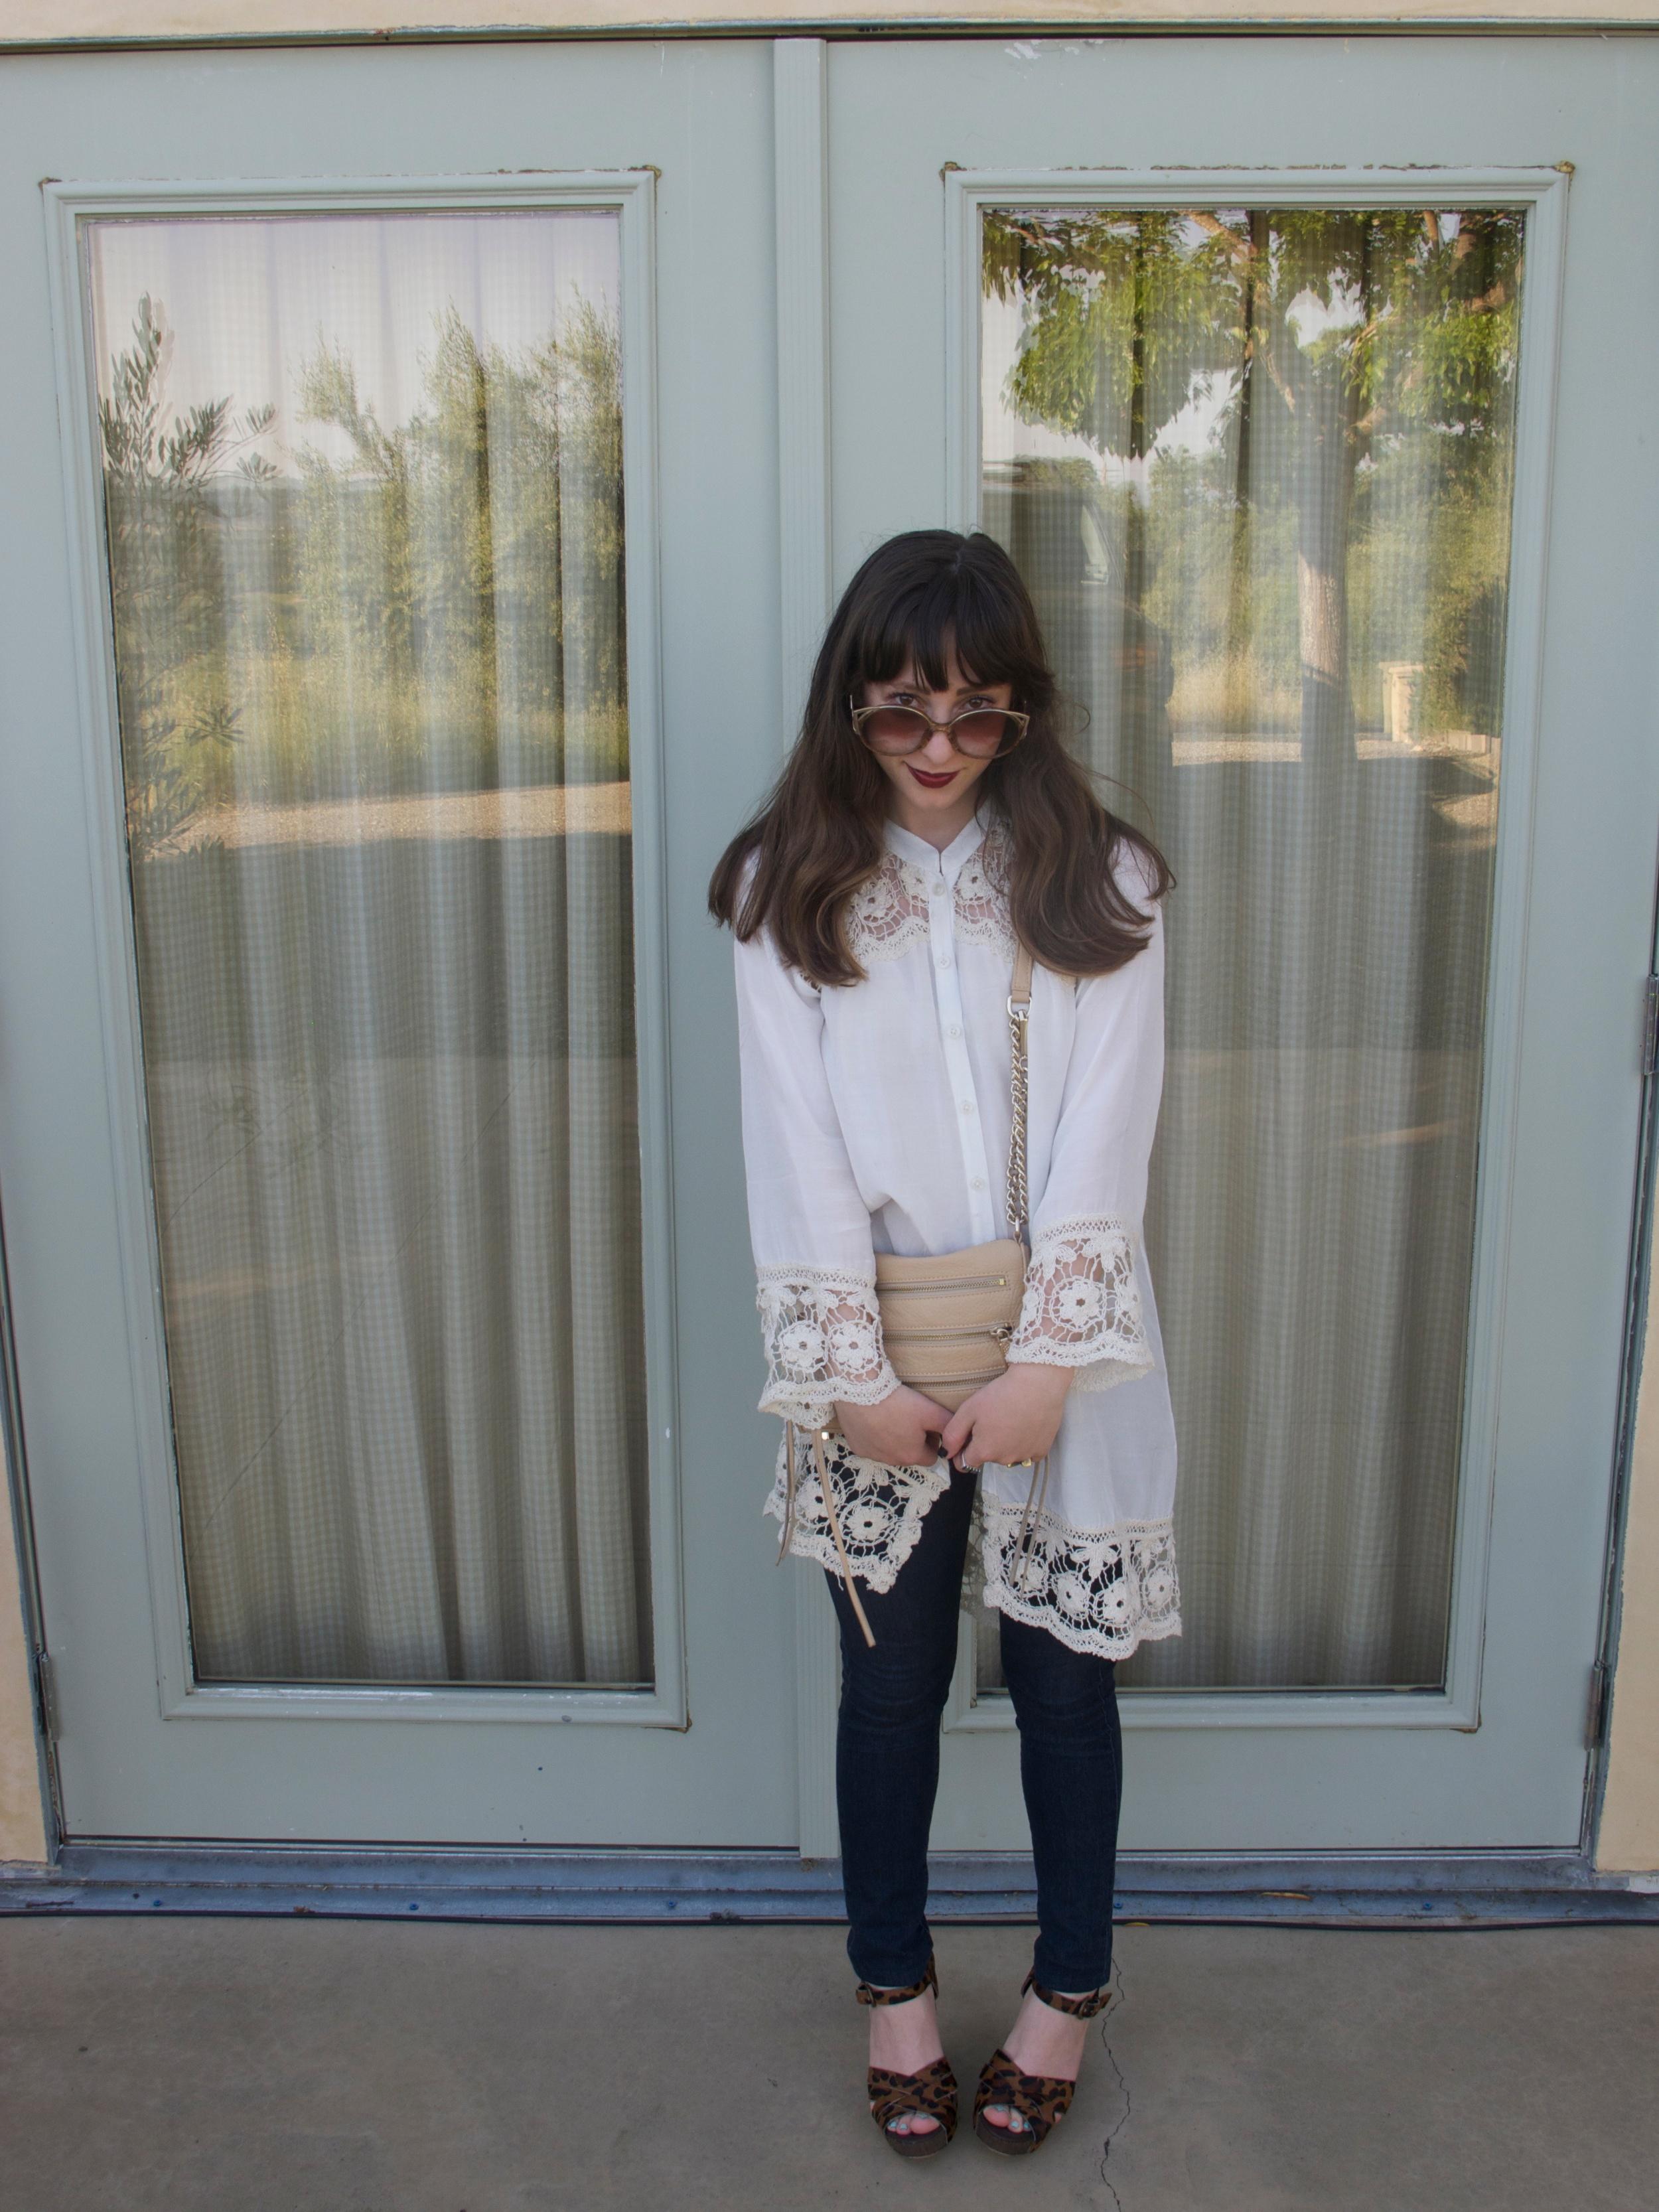 Silk & Crochet Tunic: Free People, Dark Skinny Denim: James Jeans, Leopard Wedges: Sam Edelman, 5-Zip Mini Purse: Rebecca Minkoff